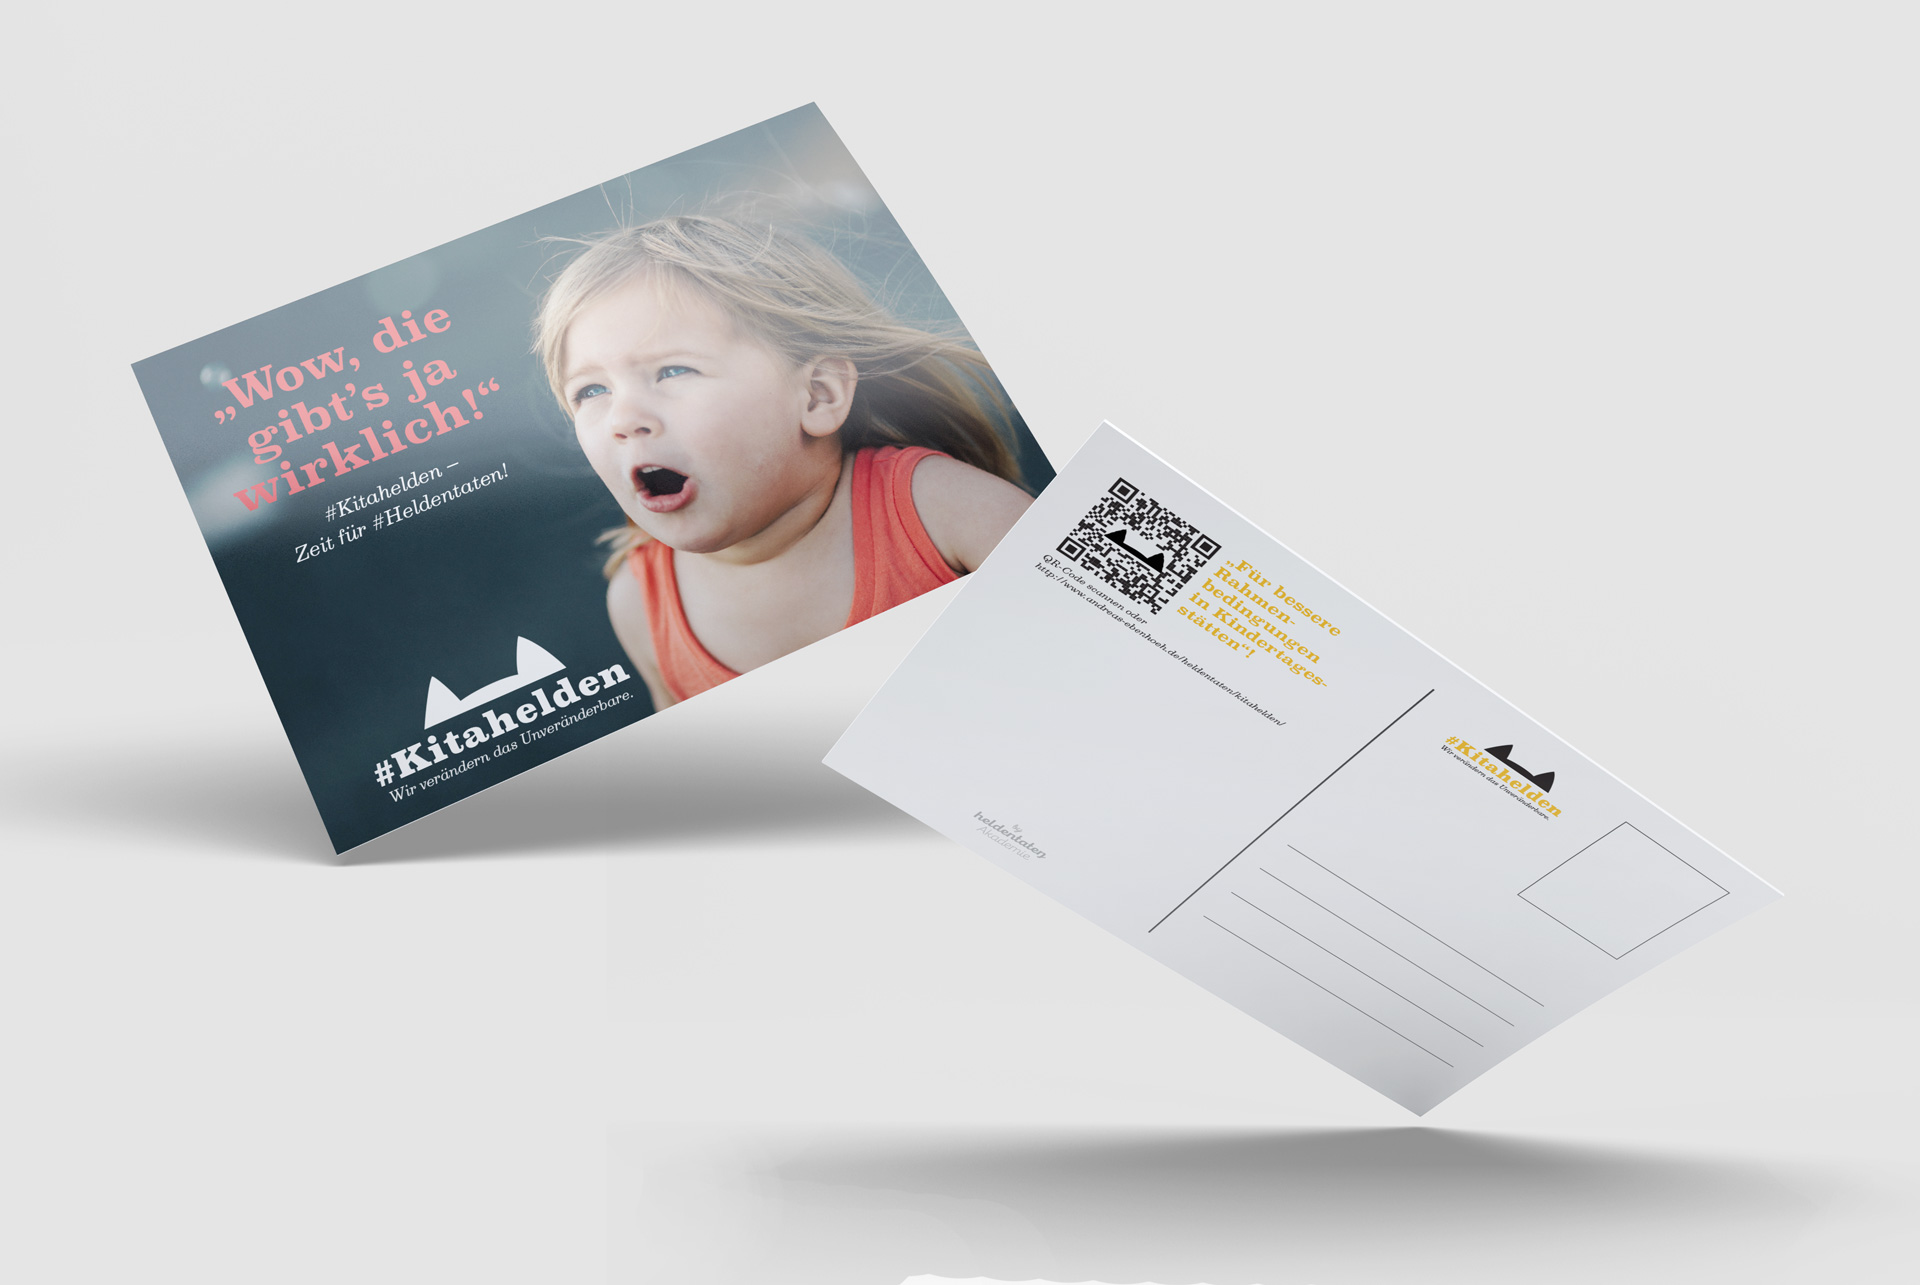 heldentaten Akademie Postkarte